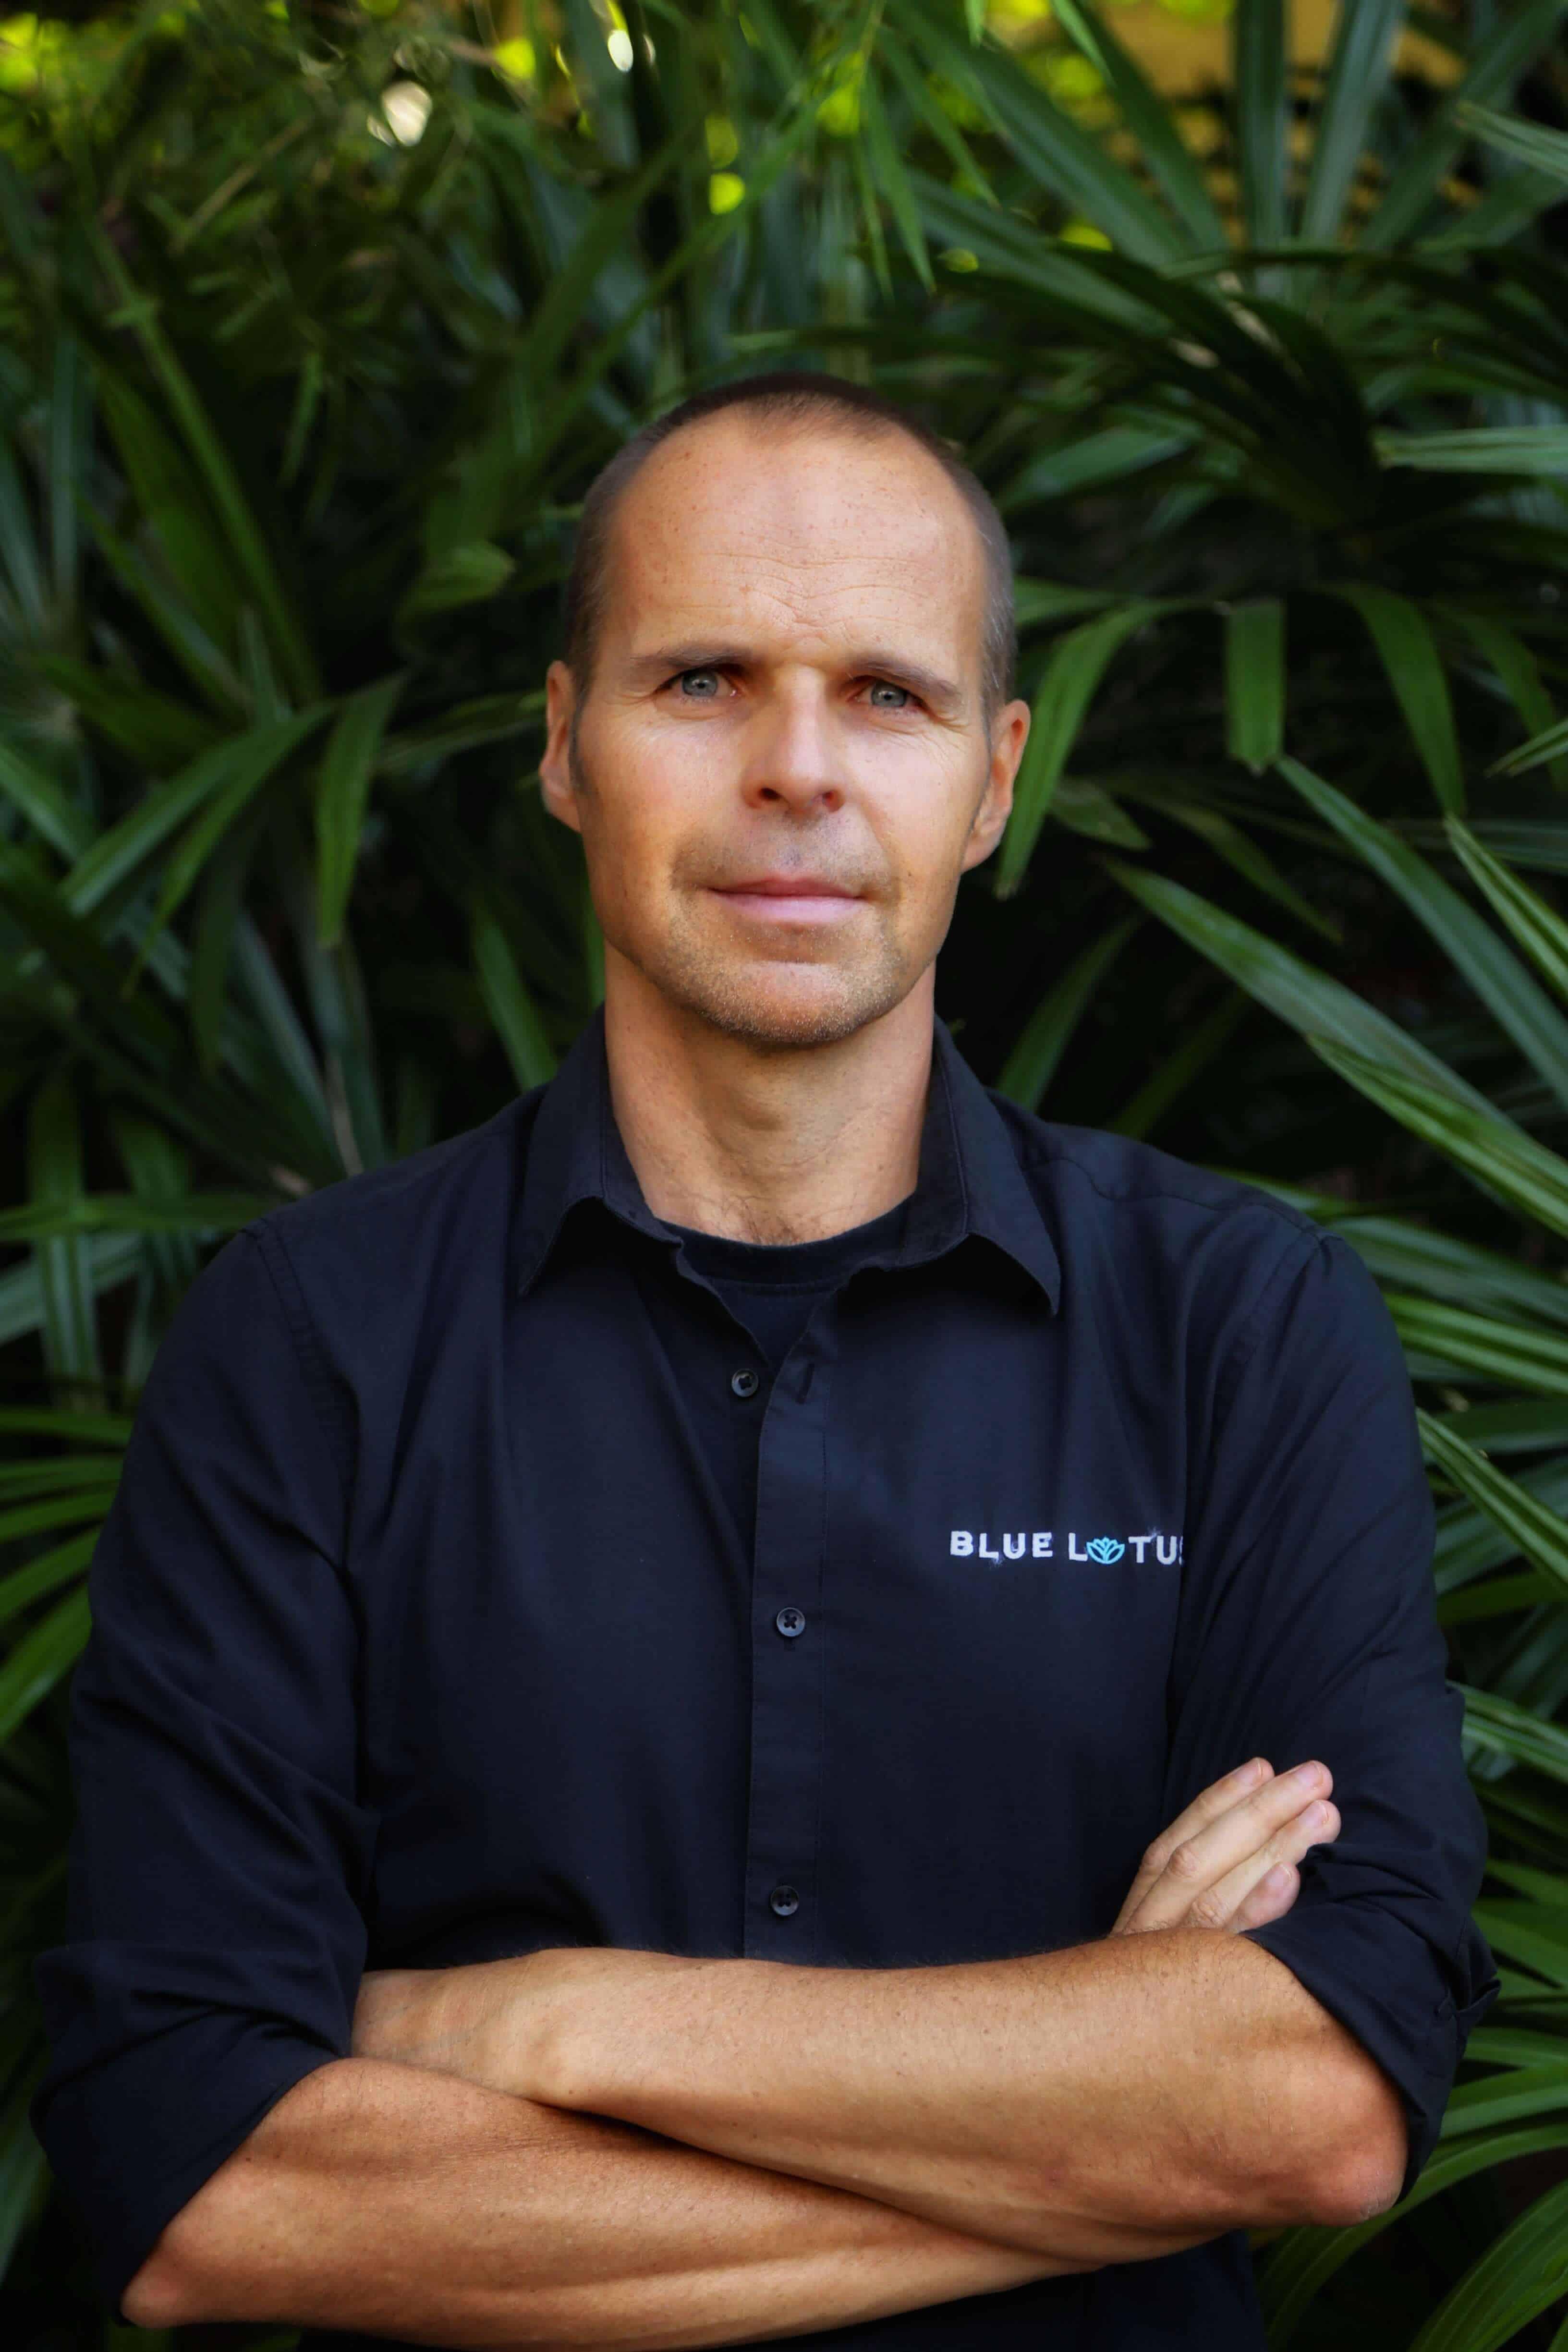 Christophe Berg from Blue Lotus Hua Hin